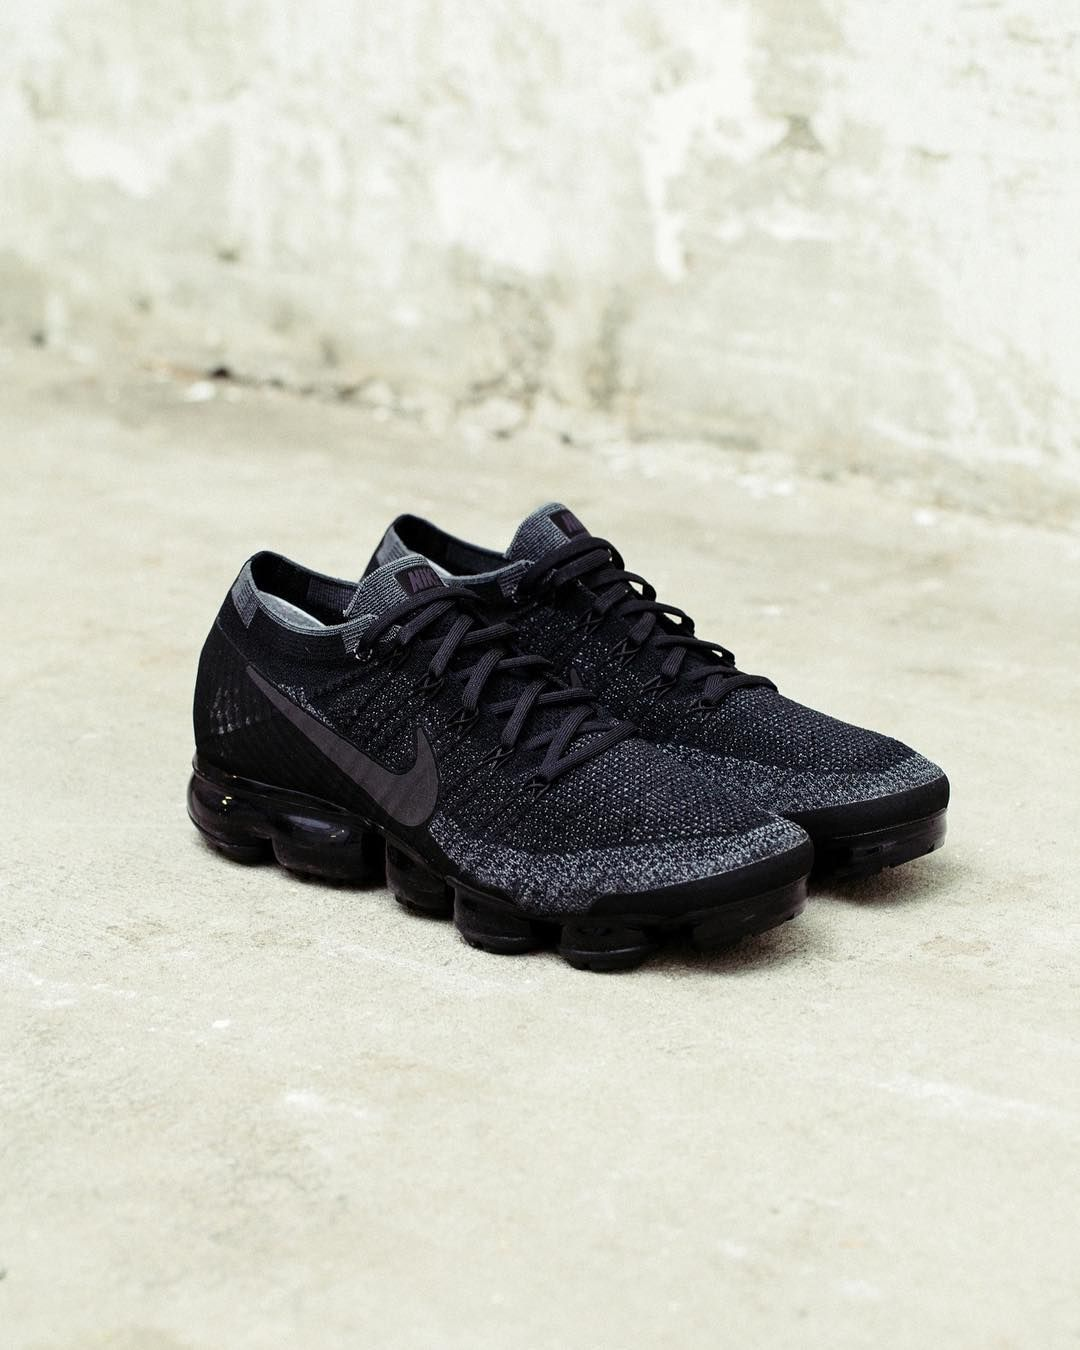 BlackFree NikeBotas En Calzado Nike Vapormax Runs Triple 2019 nOP80wXk